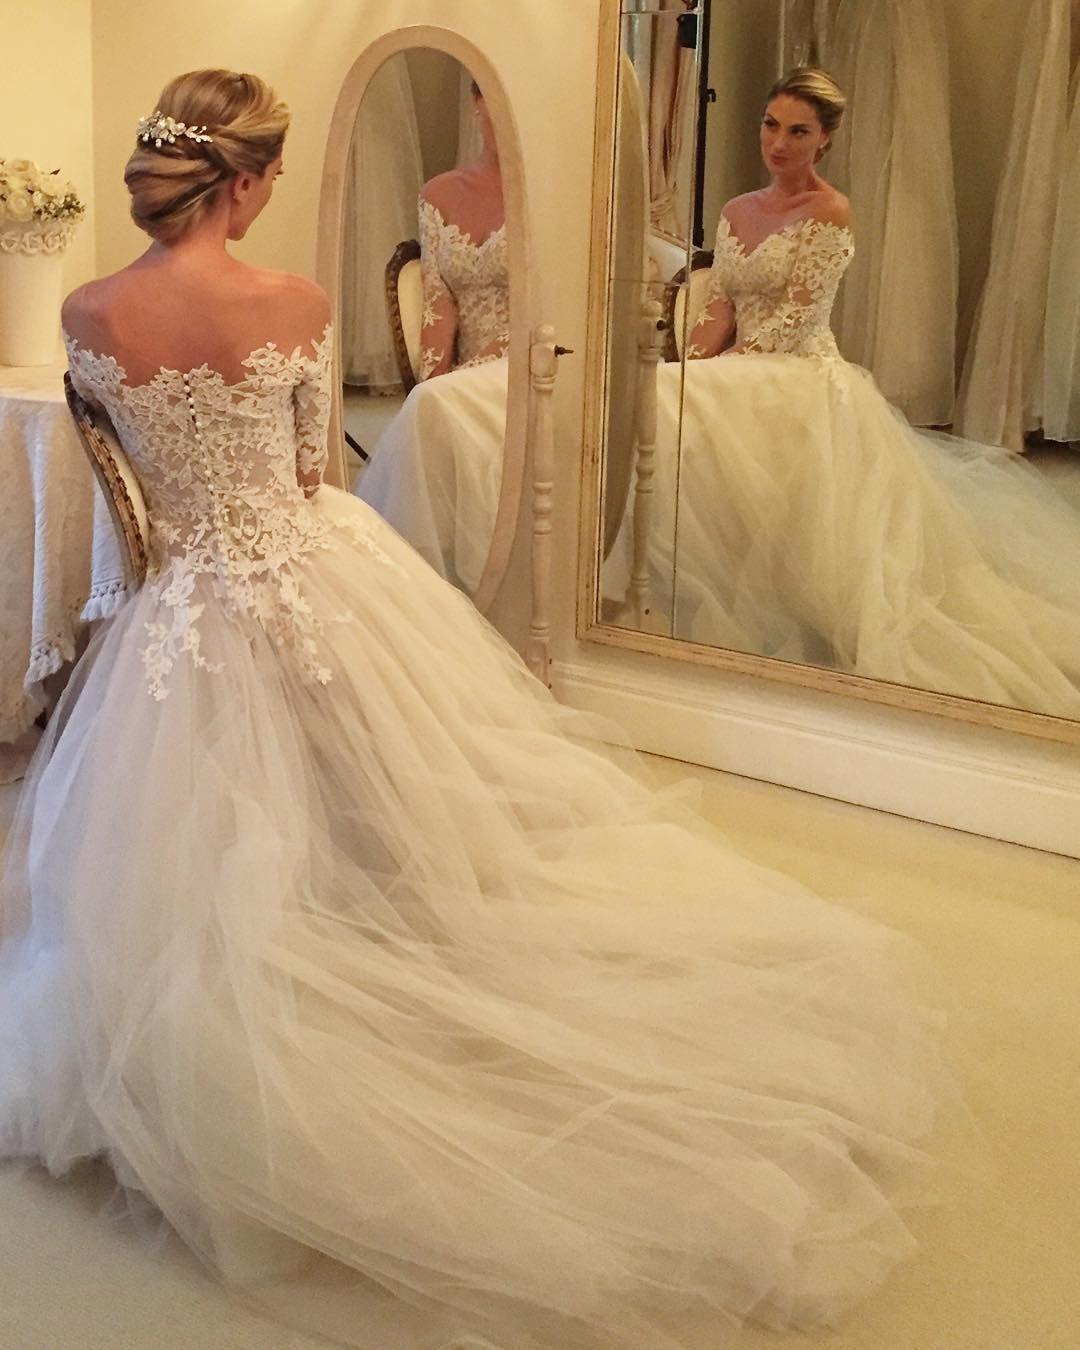 Nossa princesa @raqueltolardo  Pente @renatabernardoatelier  Cabelo e make @marcodebarros13 da @agenciafirst  Vestido @wanda_borges  Foto @larissafelsen  #noiva #bride #casamento #wedding by constancezahn